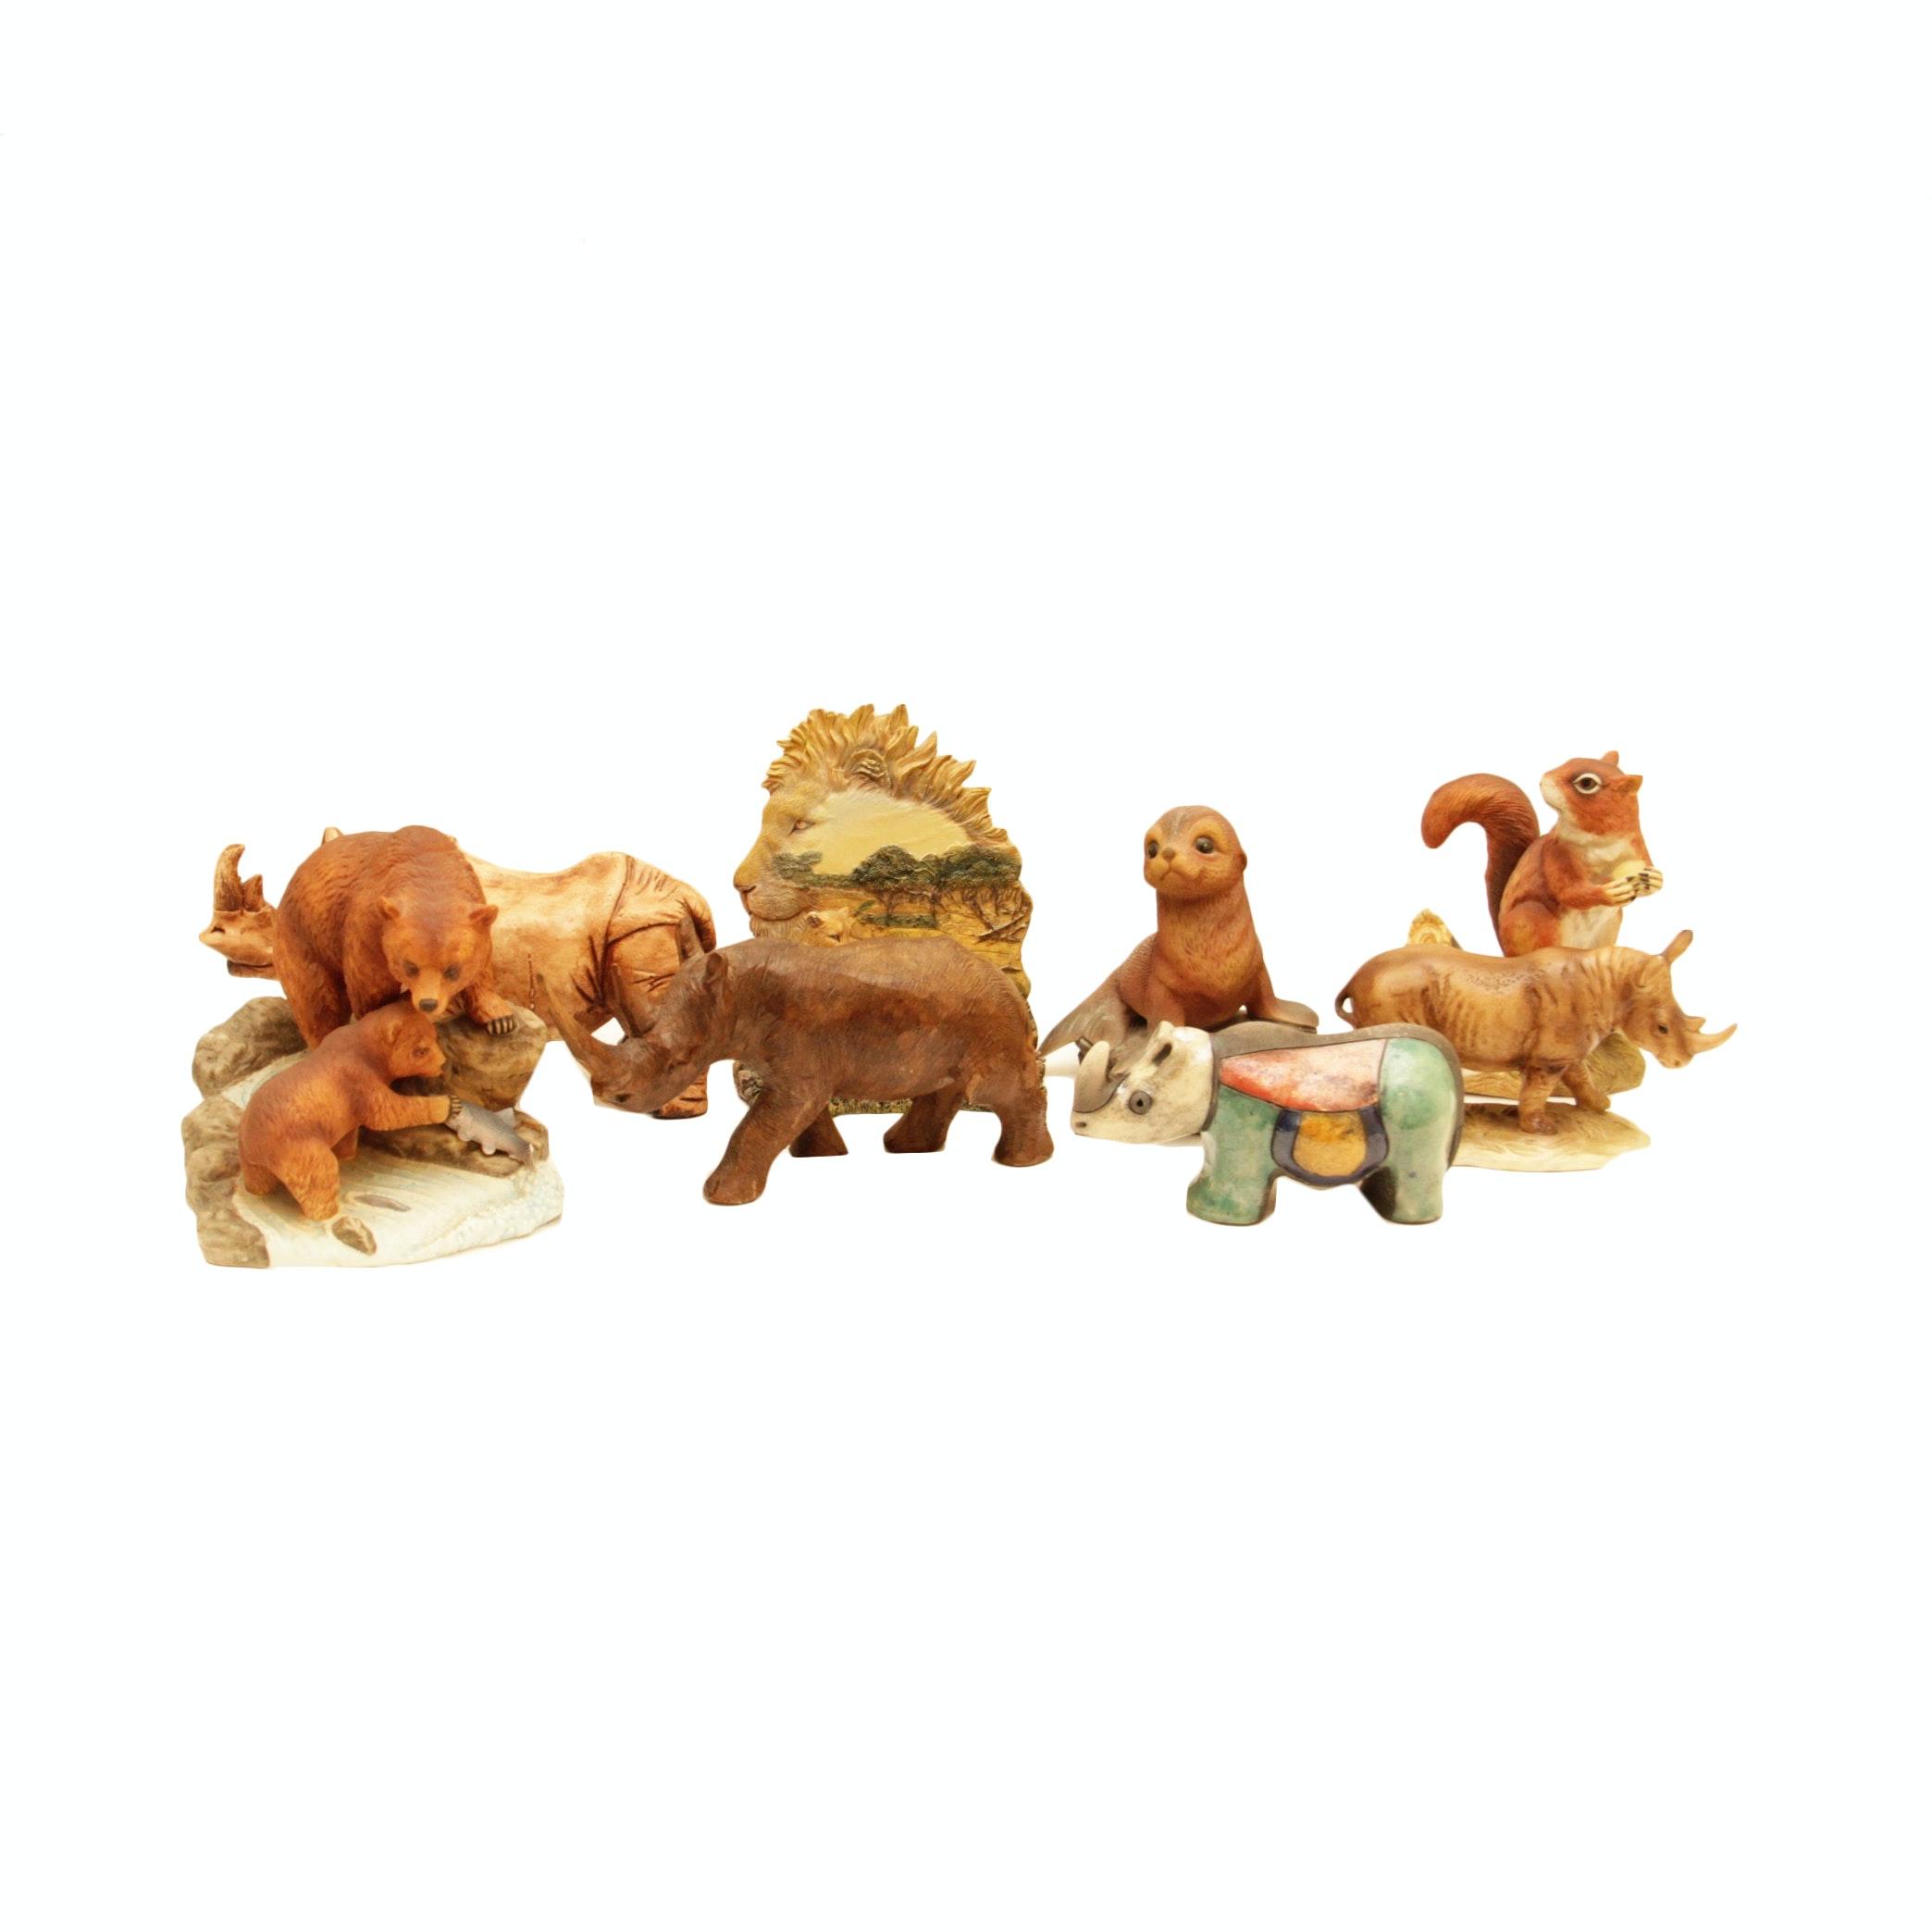 Collection of Ceramic Animals